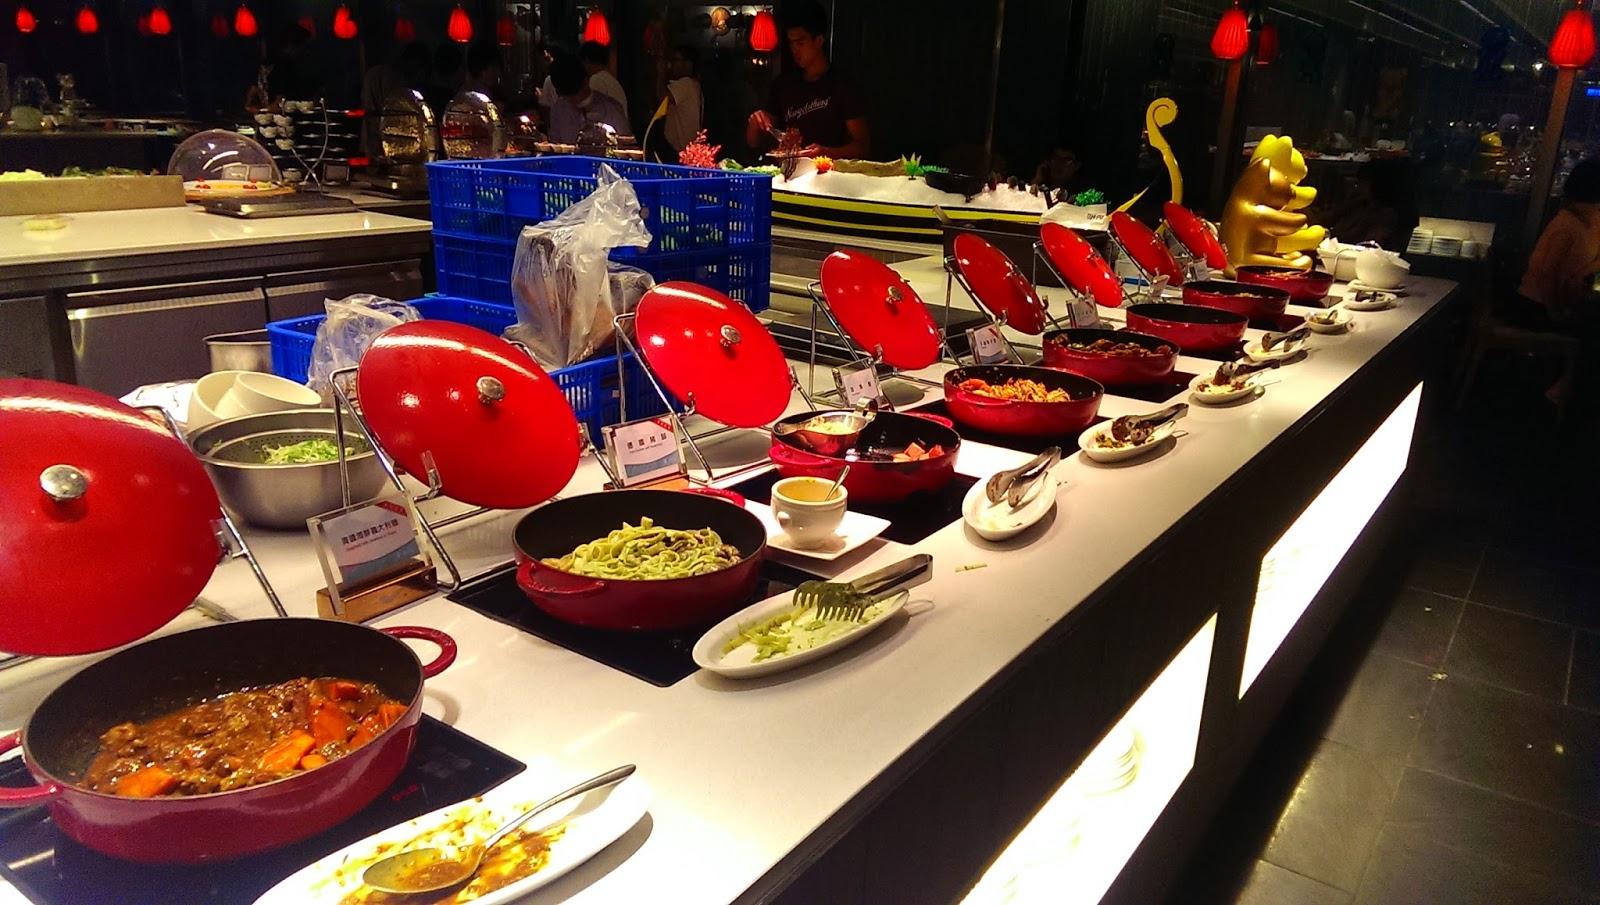 2015 07 01%2B20.10.02 - [食記] 台北京站 - 饗食天堂,有生魚片吃到飽的高級自助餐廳!